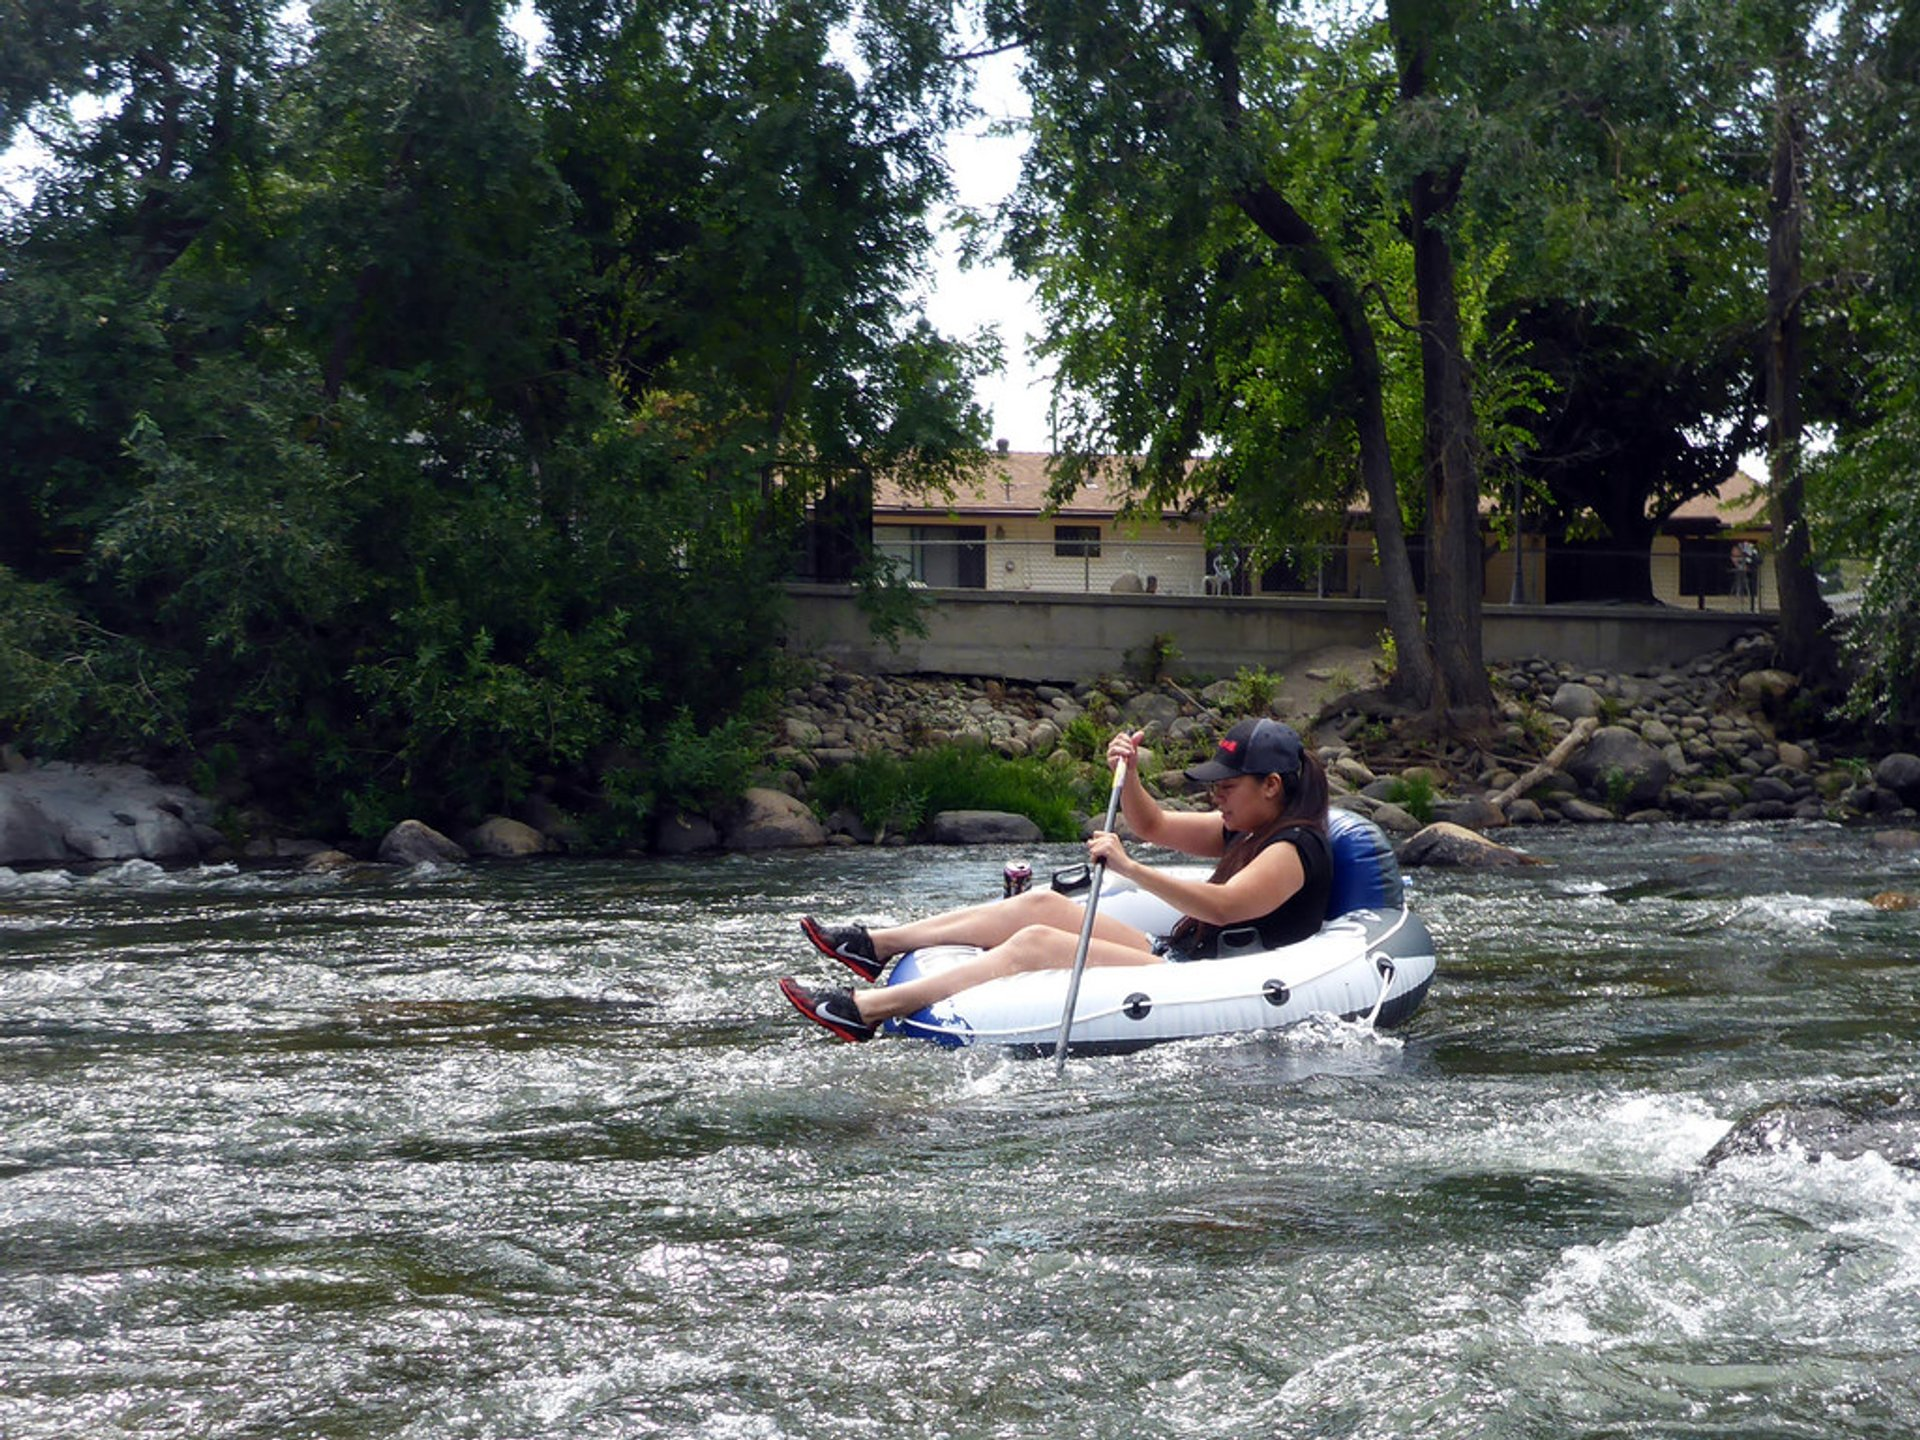 Truckee River Tubing in Nevada - Best Season 2020